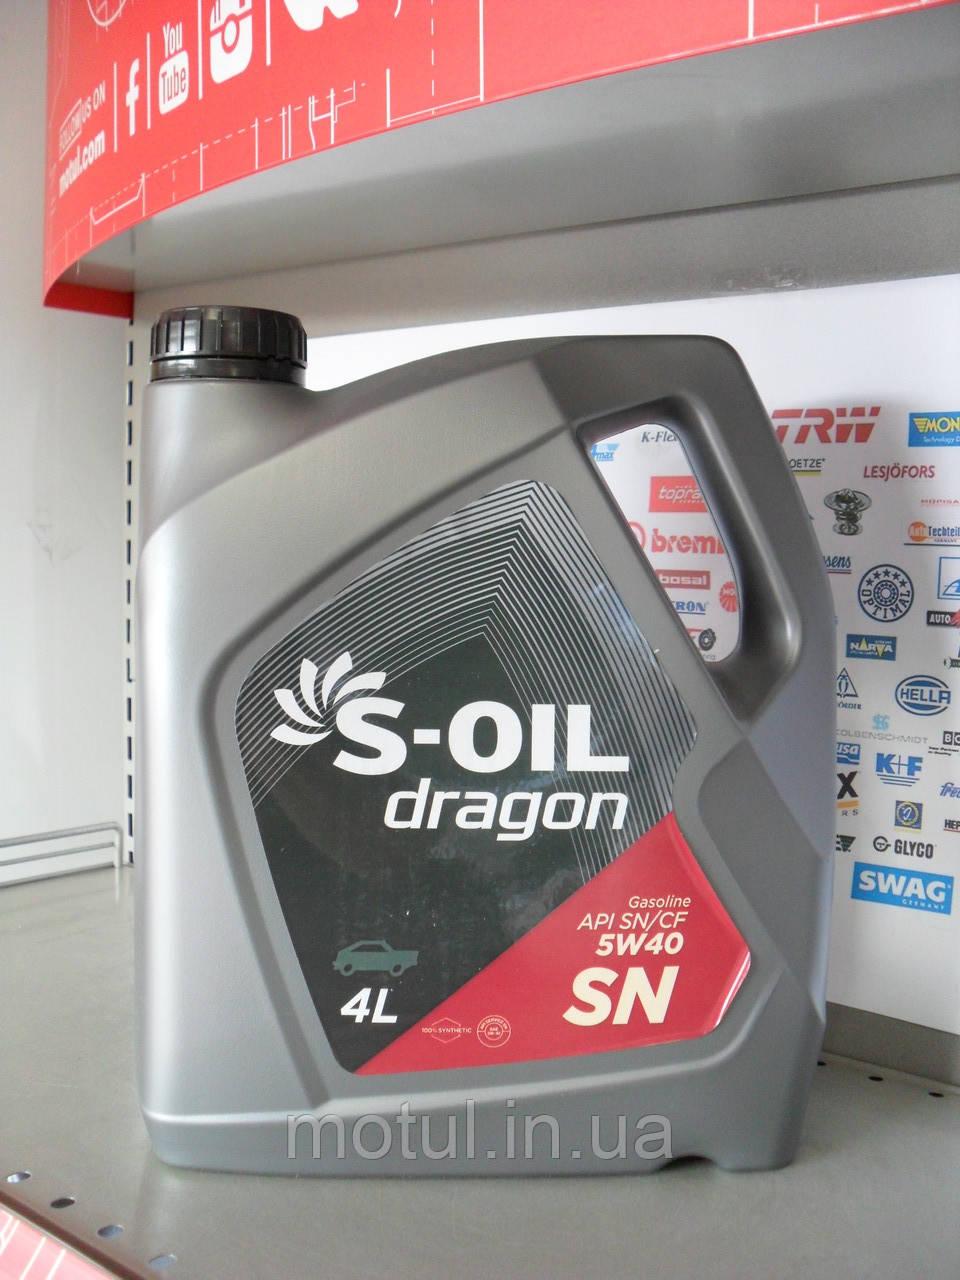 Моторне масло S-oil dragon sn 5w40